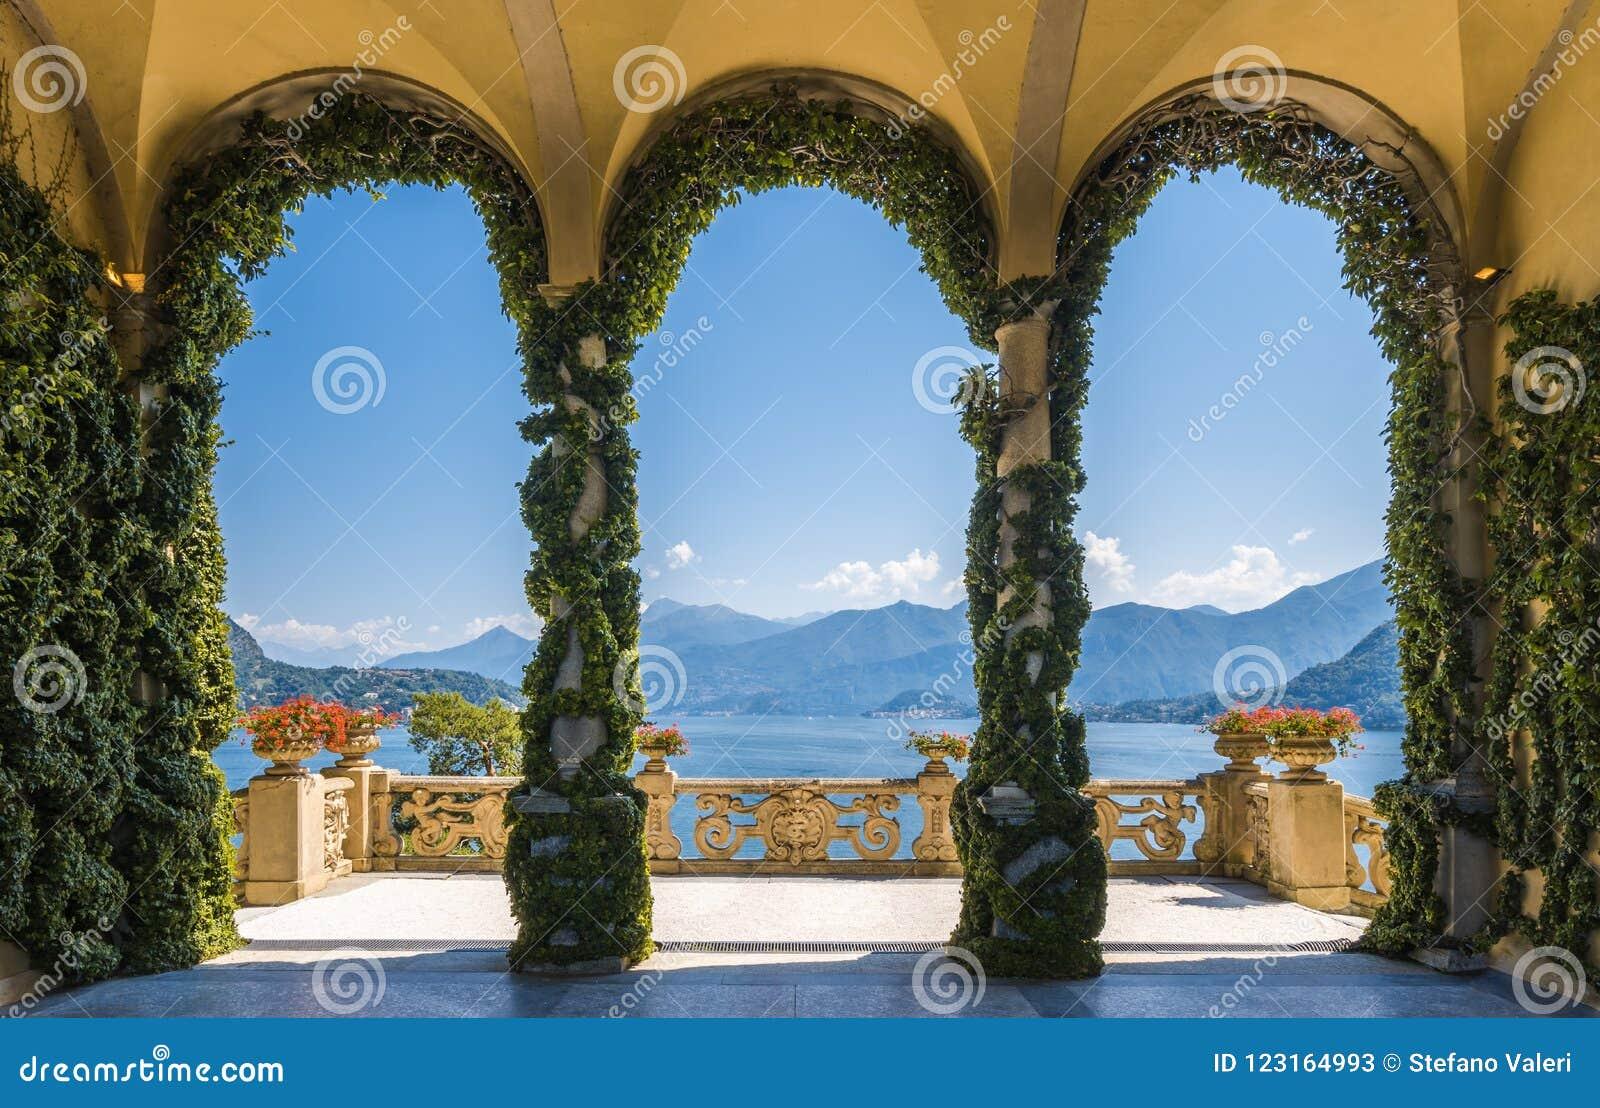 Lago de negligência Como do balcão cênico na Casa de campo famosa del Balbianello, no comune de Lenno Lombardy, Italy